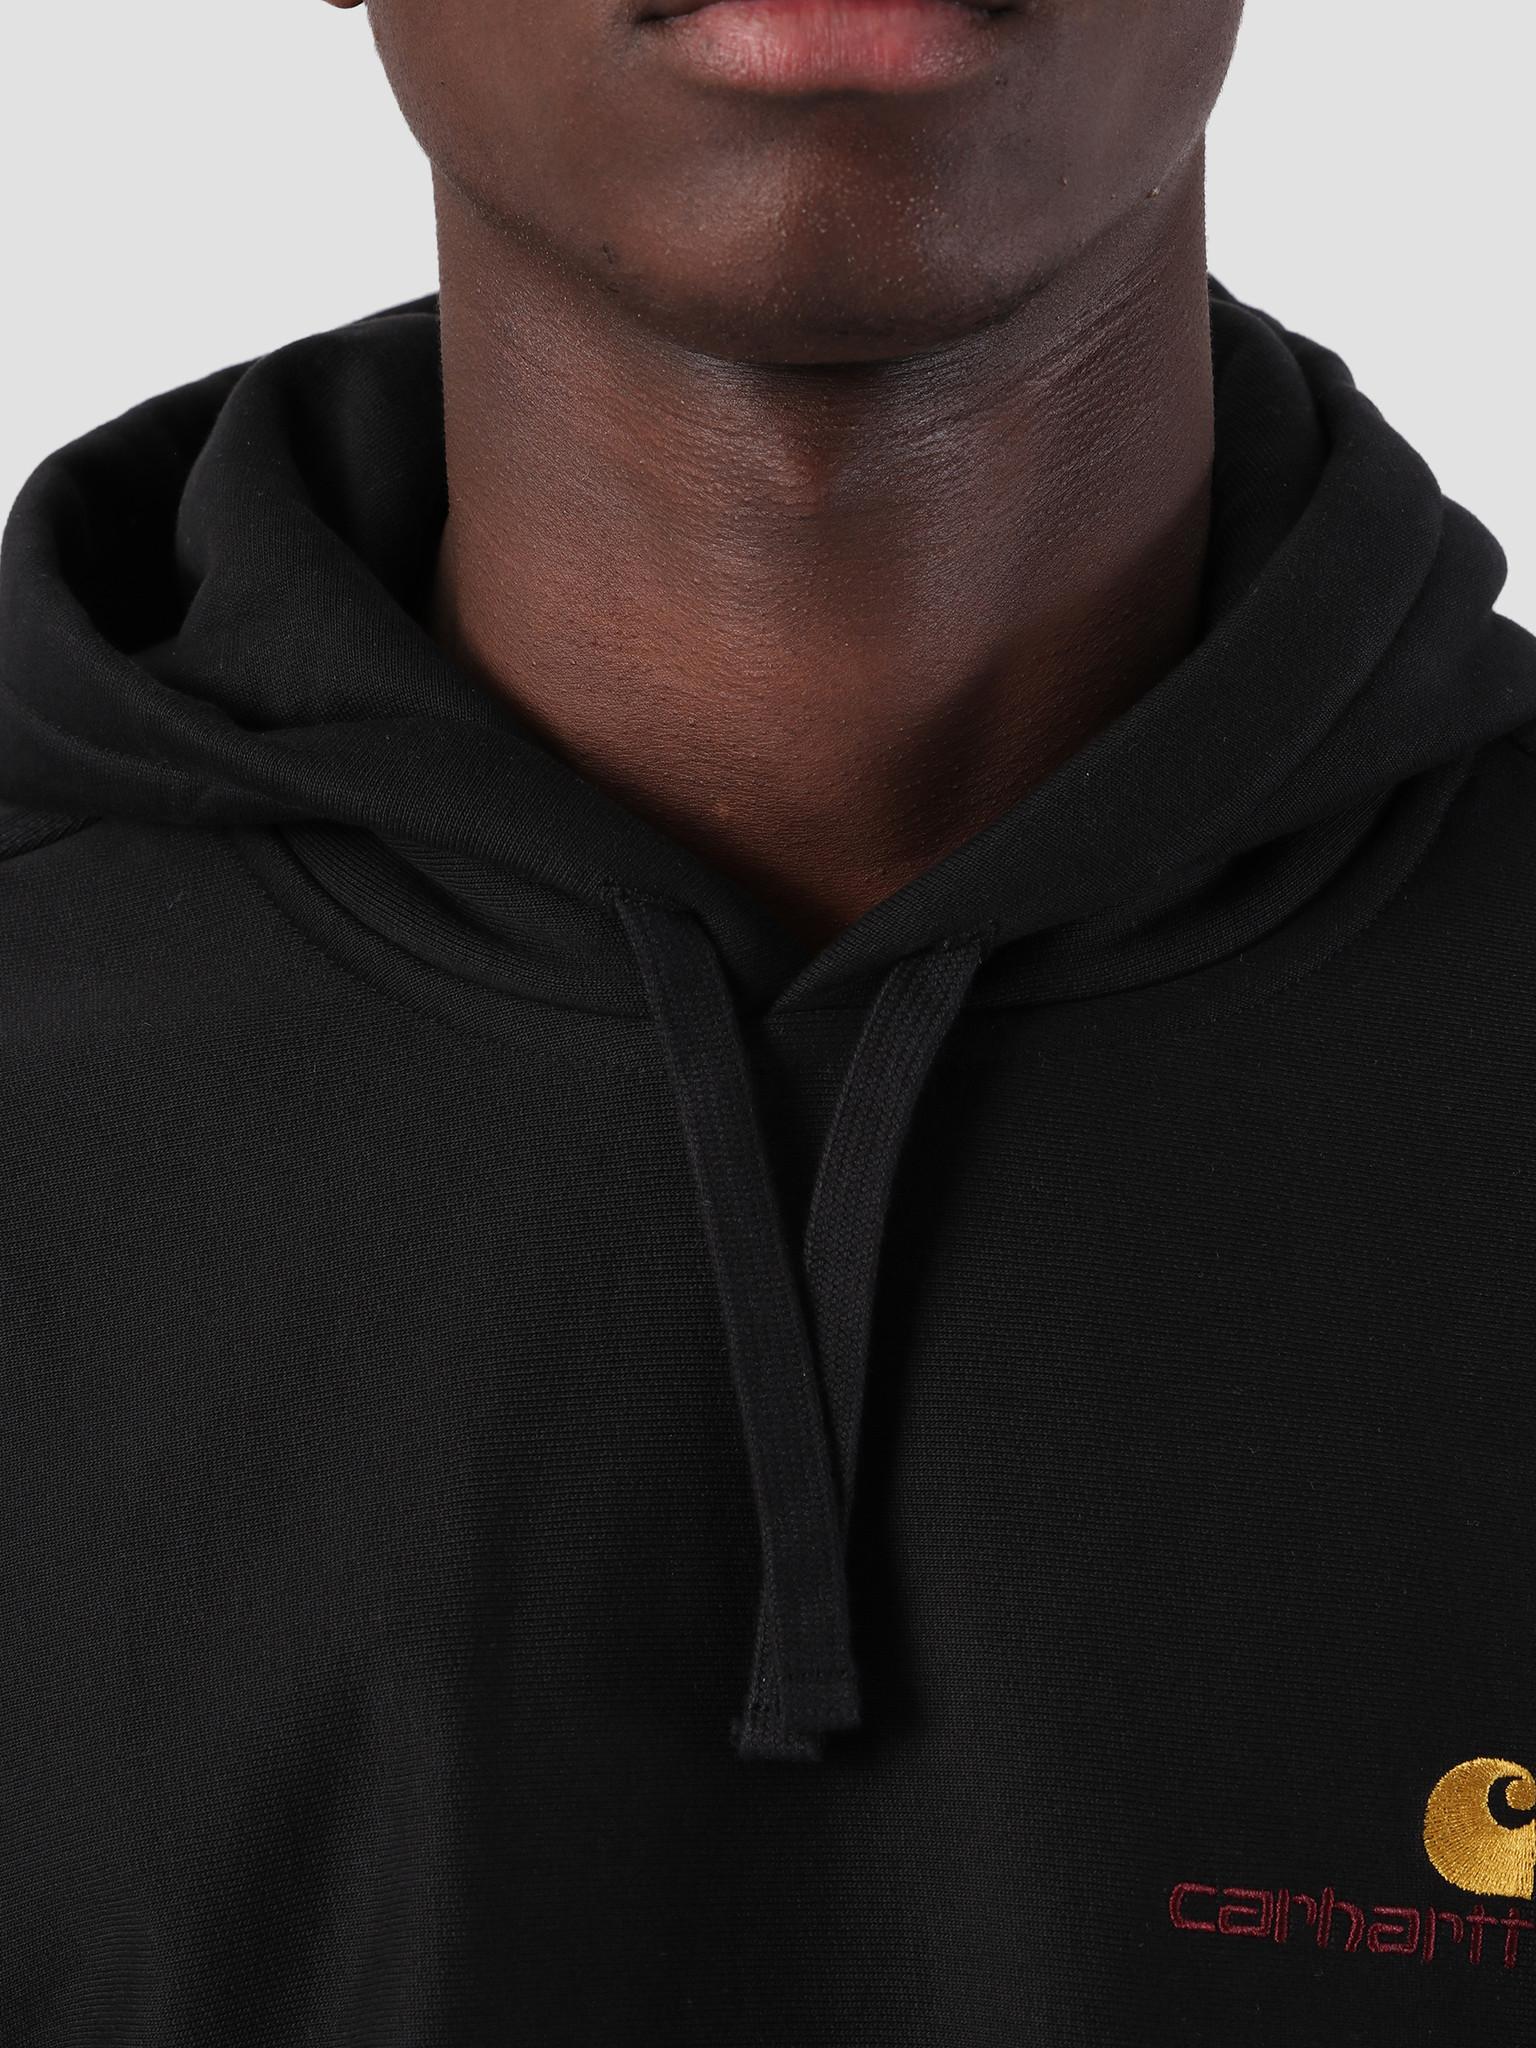 Carhartt WIP Carhartt WIP Hooded American Script Sweat Black I027041